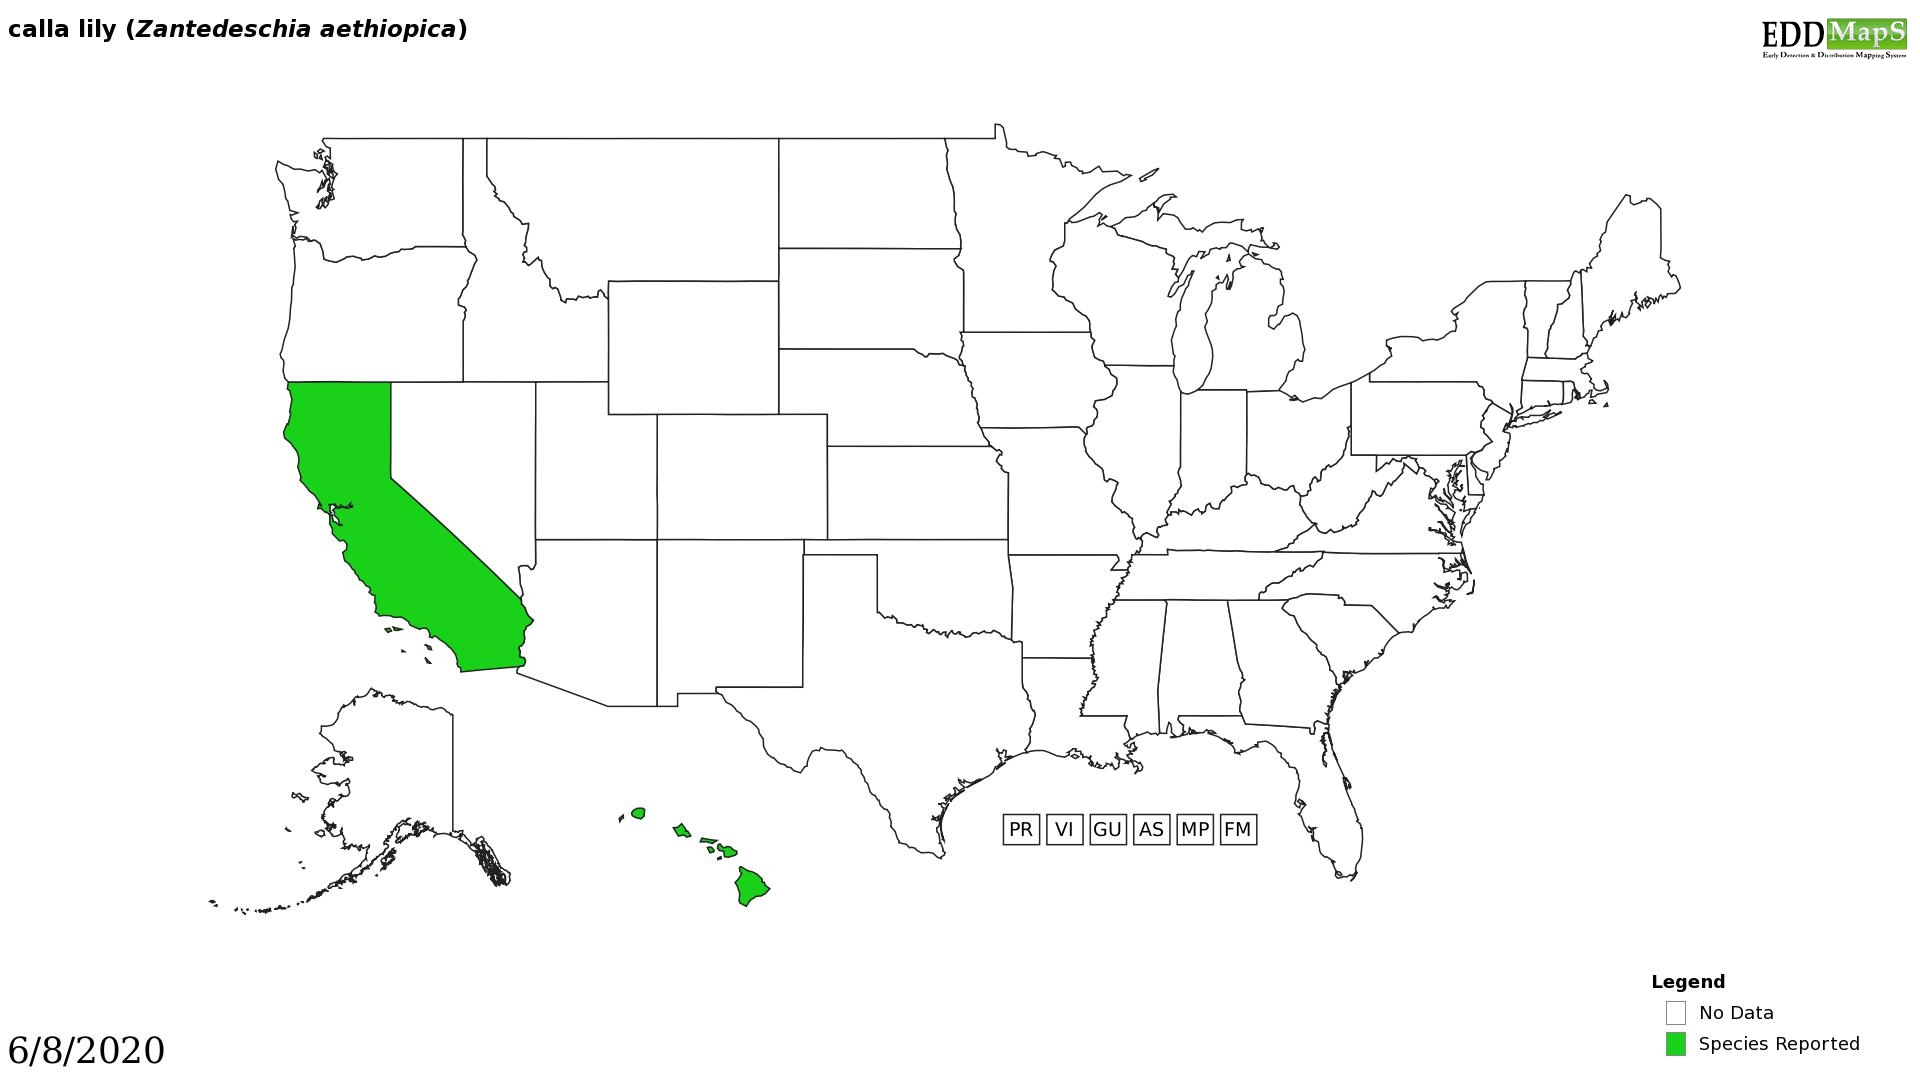 Calla lily distribution - United States